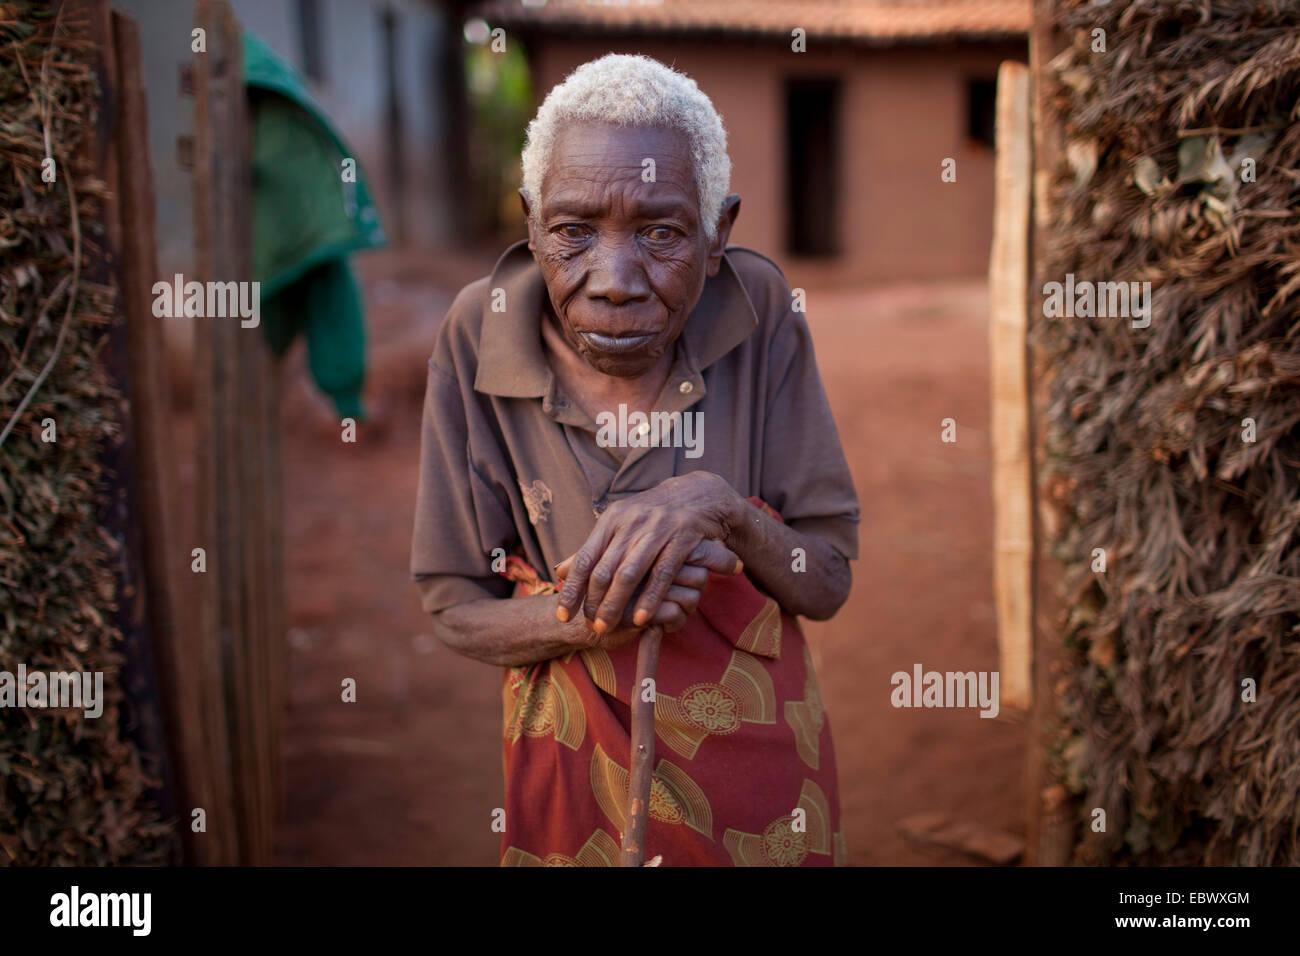 portrait of old woman at the entrance, Burundi, Karuzi, Buhiga - Stock Image